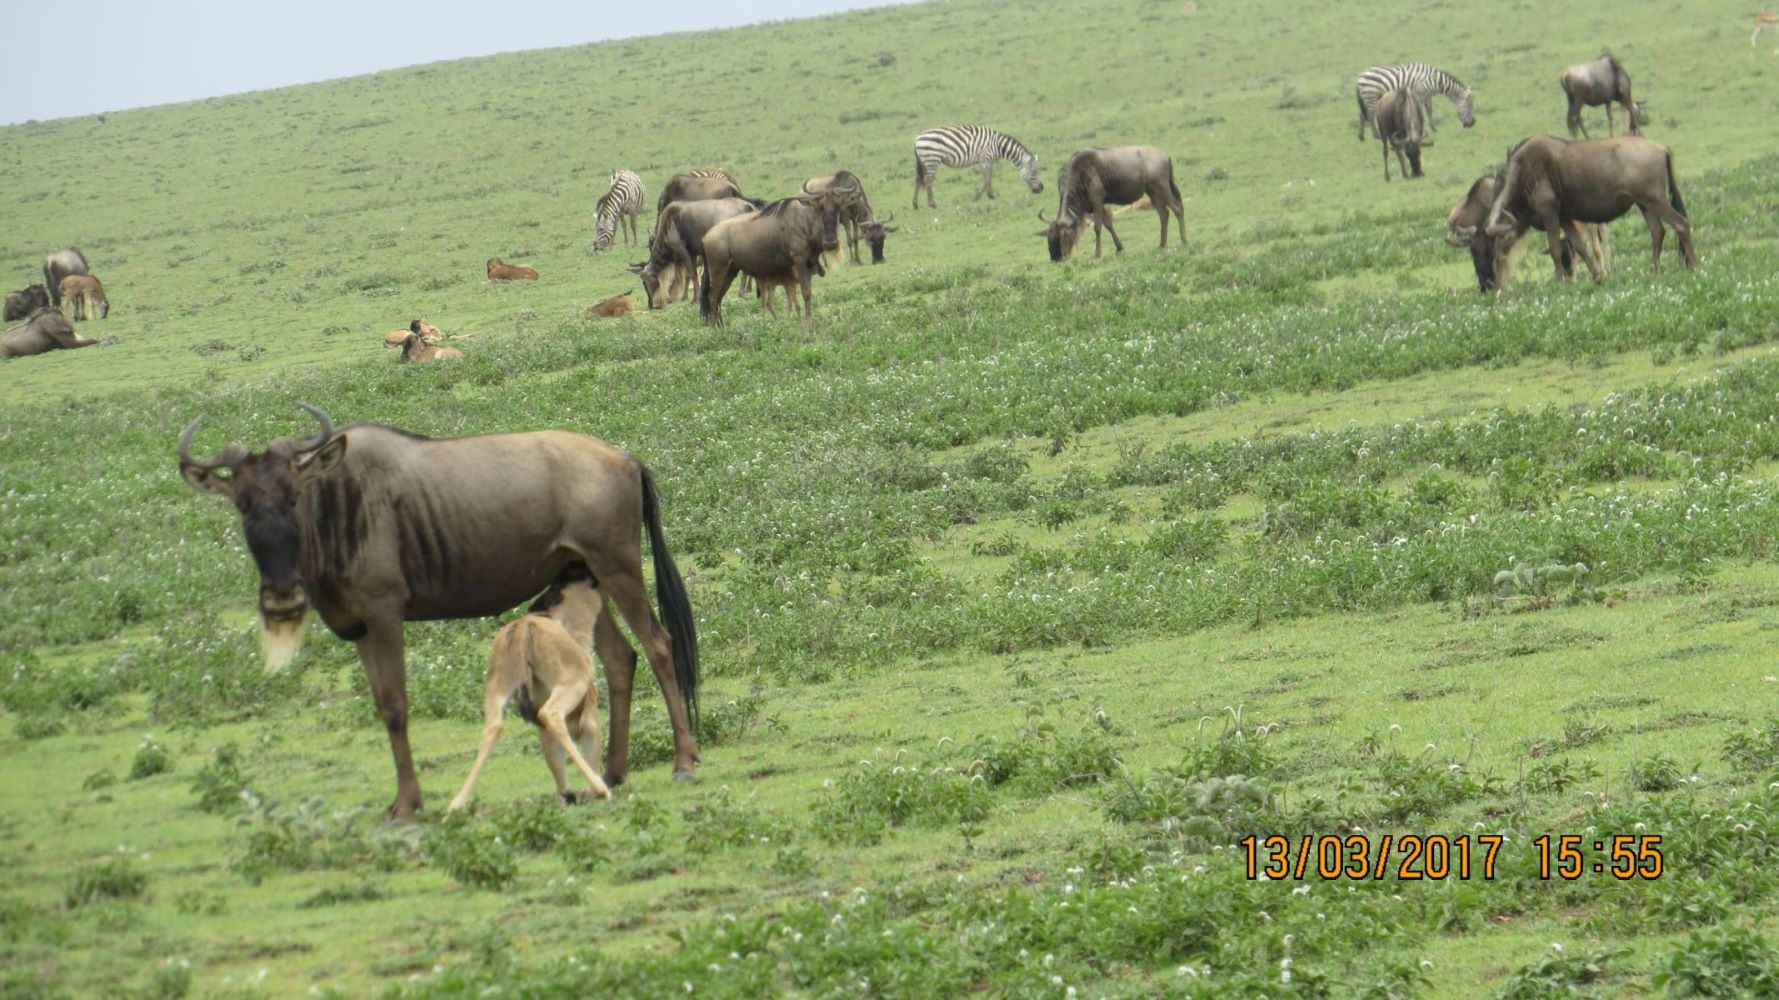 PHOTOSHOOT AT TANZANIA